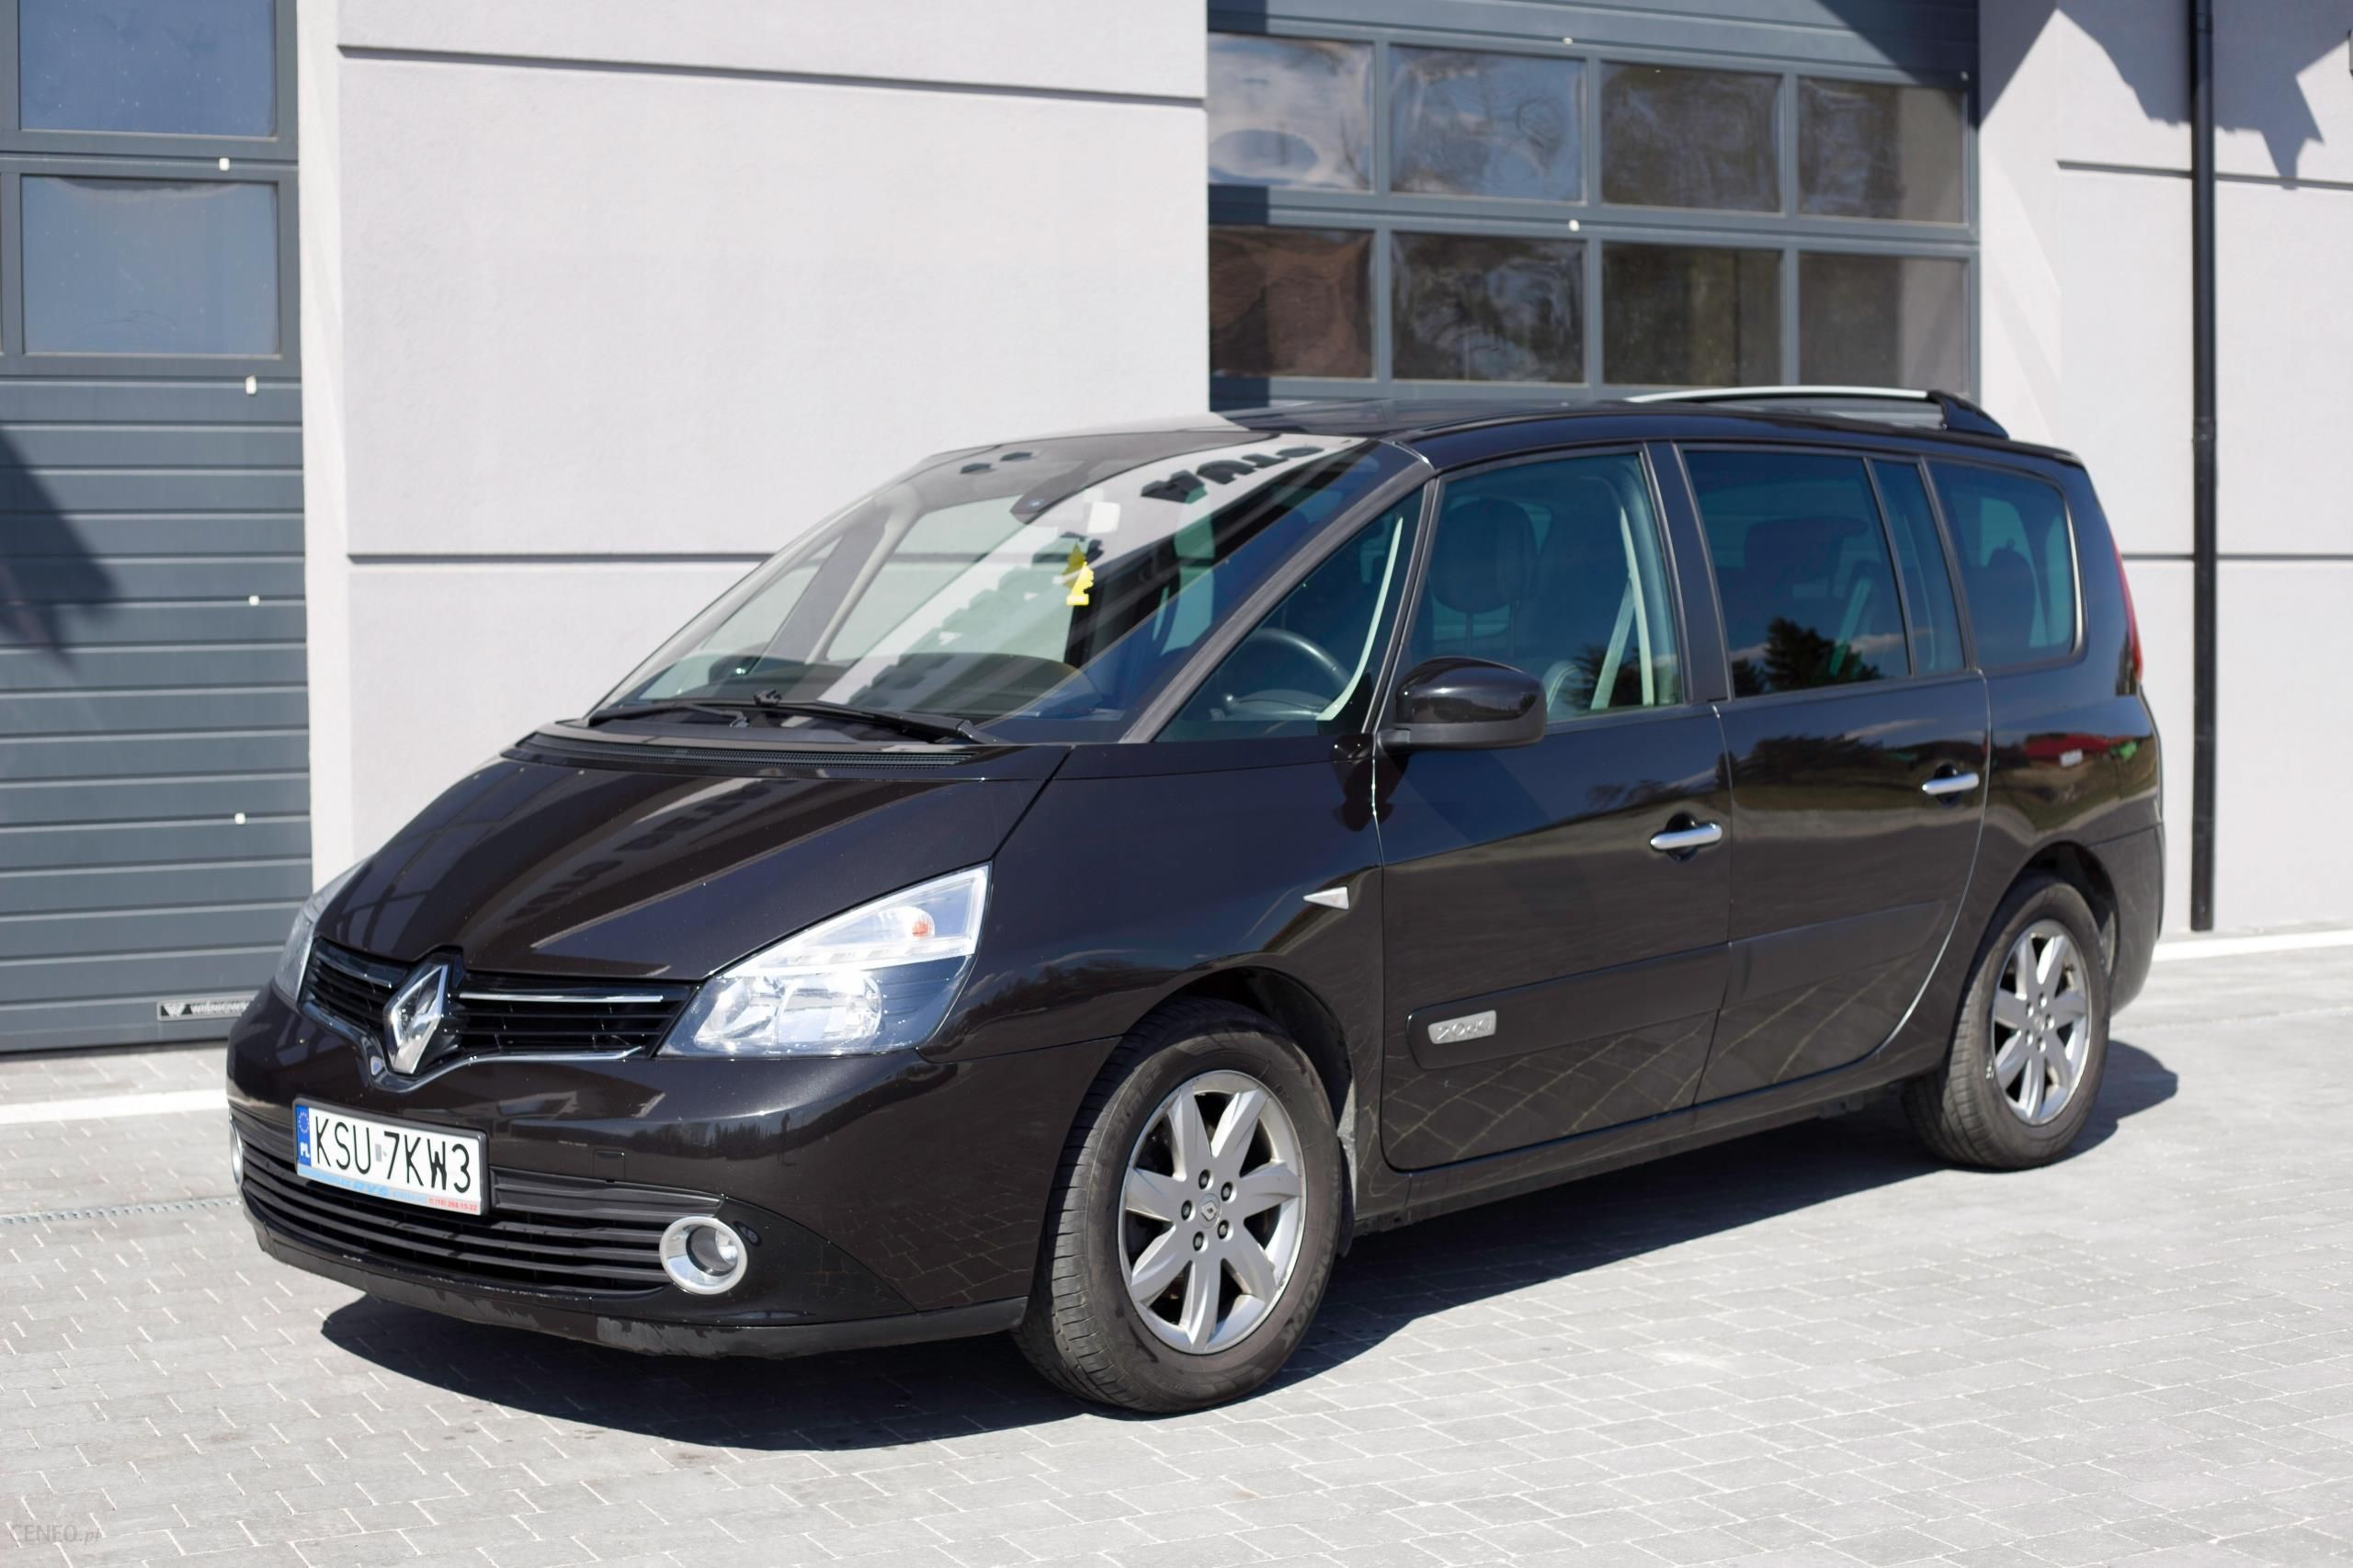 Renault Espace 7 Osobowy 2 0 Diesel Fv Cena Brutto Opinie I Ceny Na Ceneo Pl